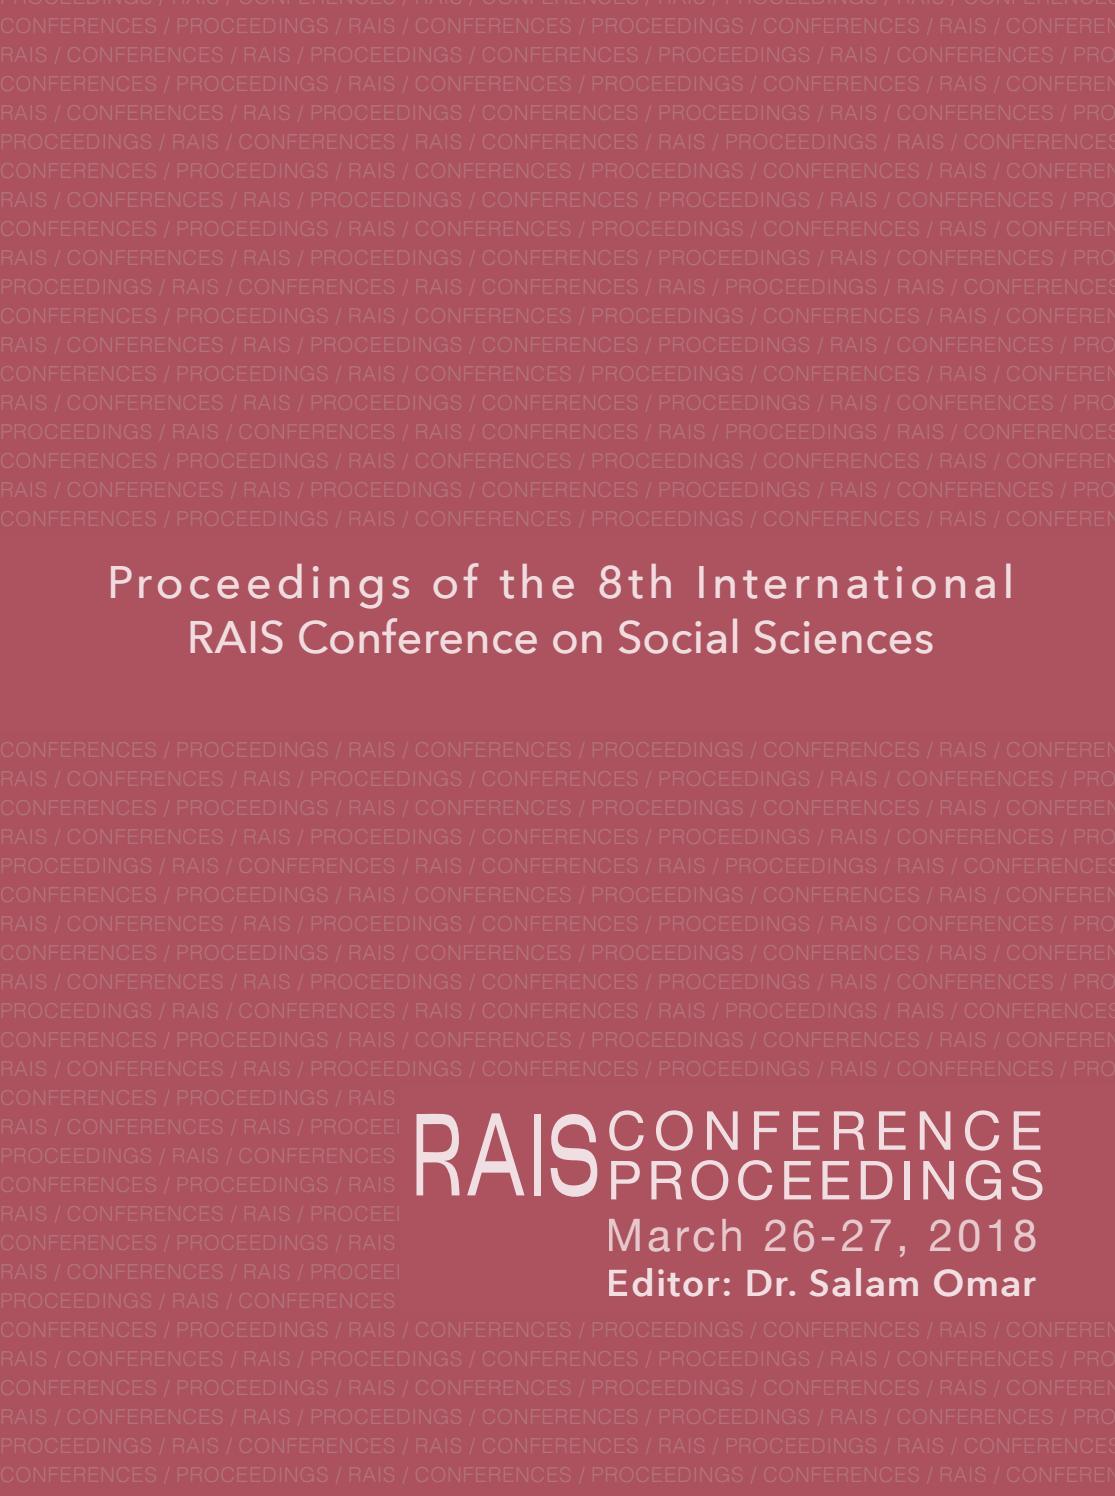 RAIS Conference Proceedings The 8th International